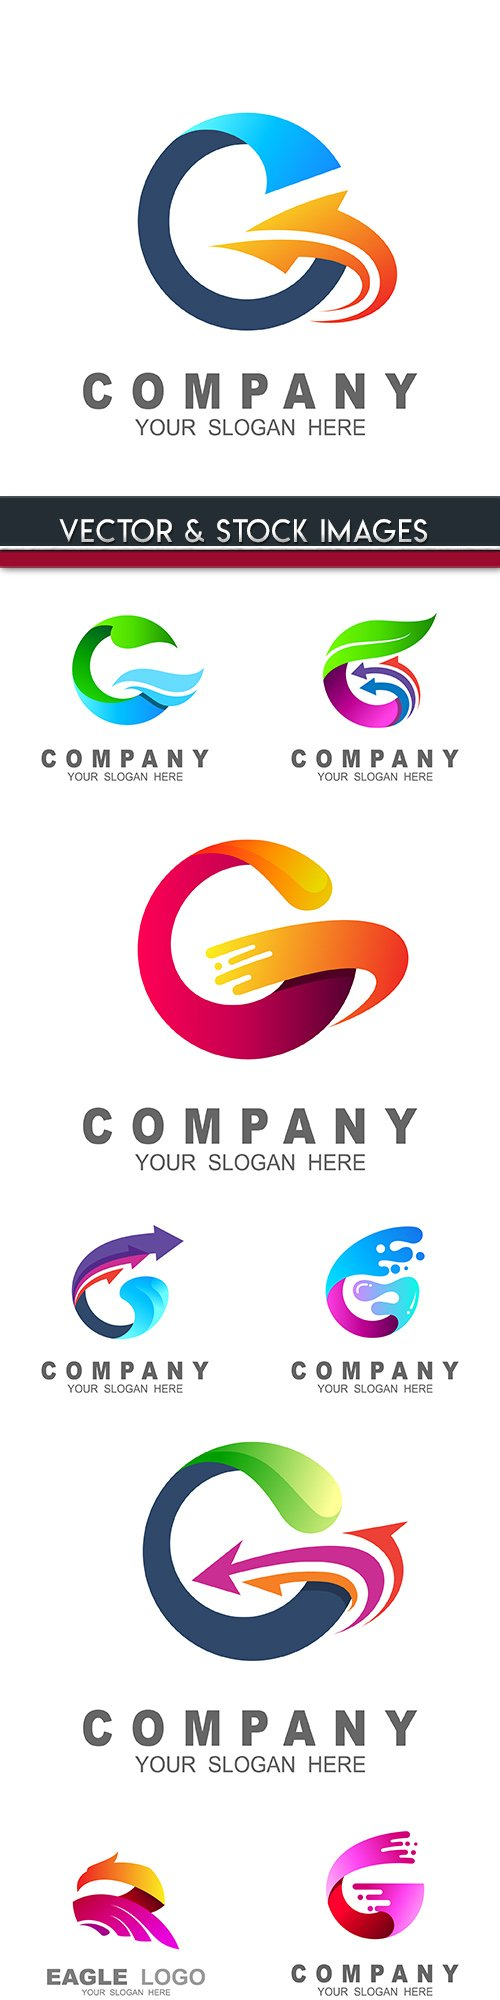 Creative business logos company design 28